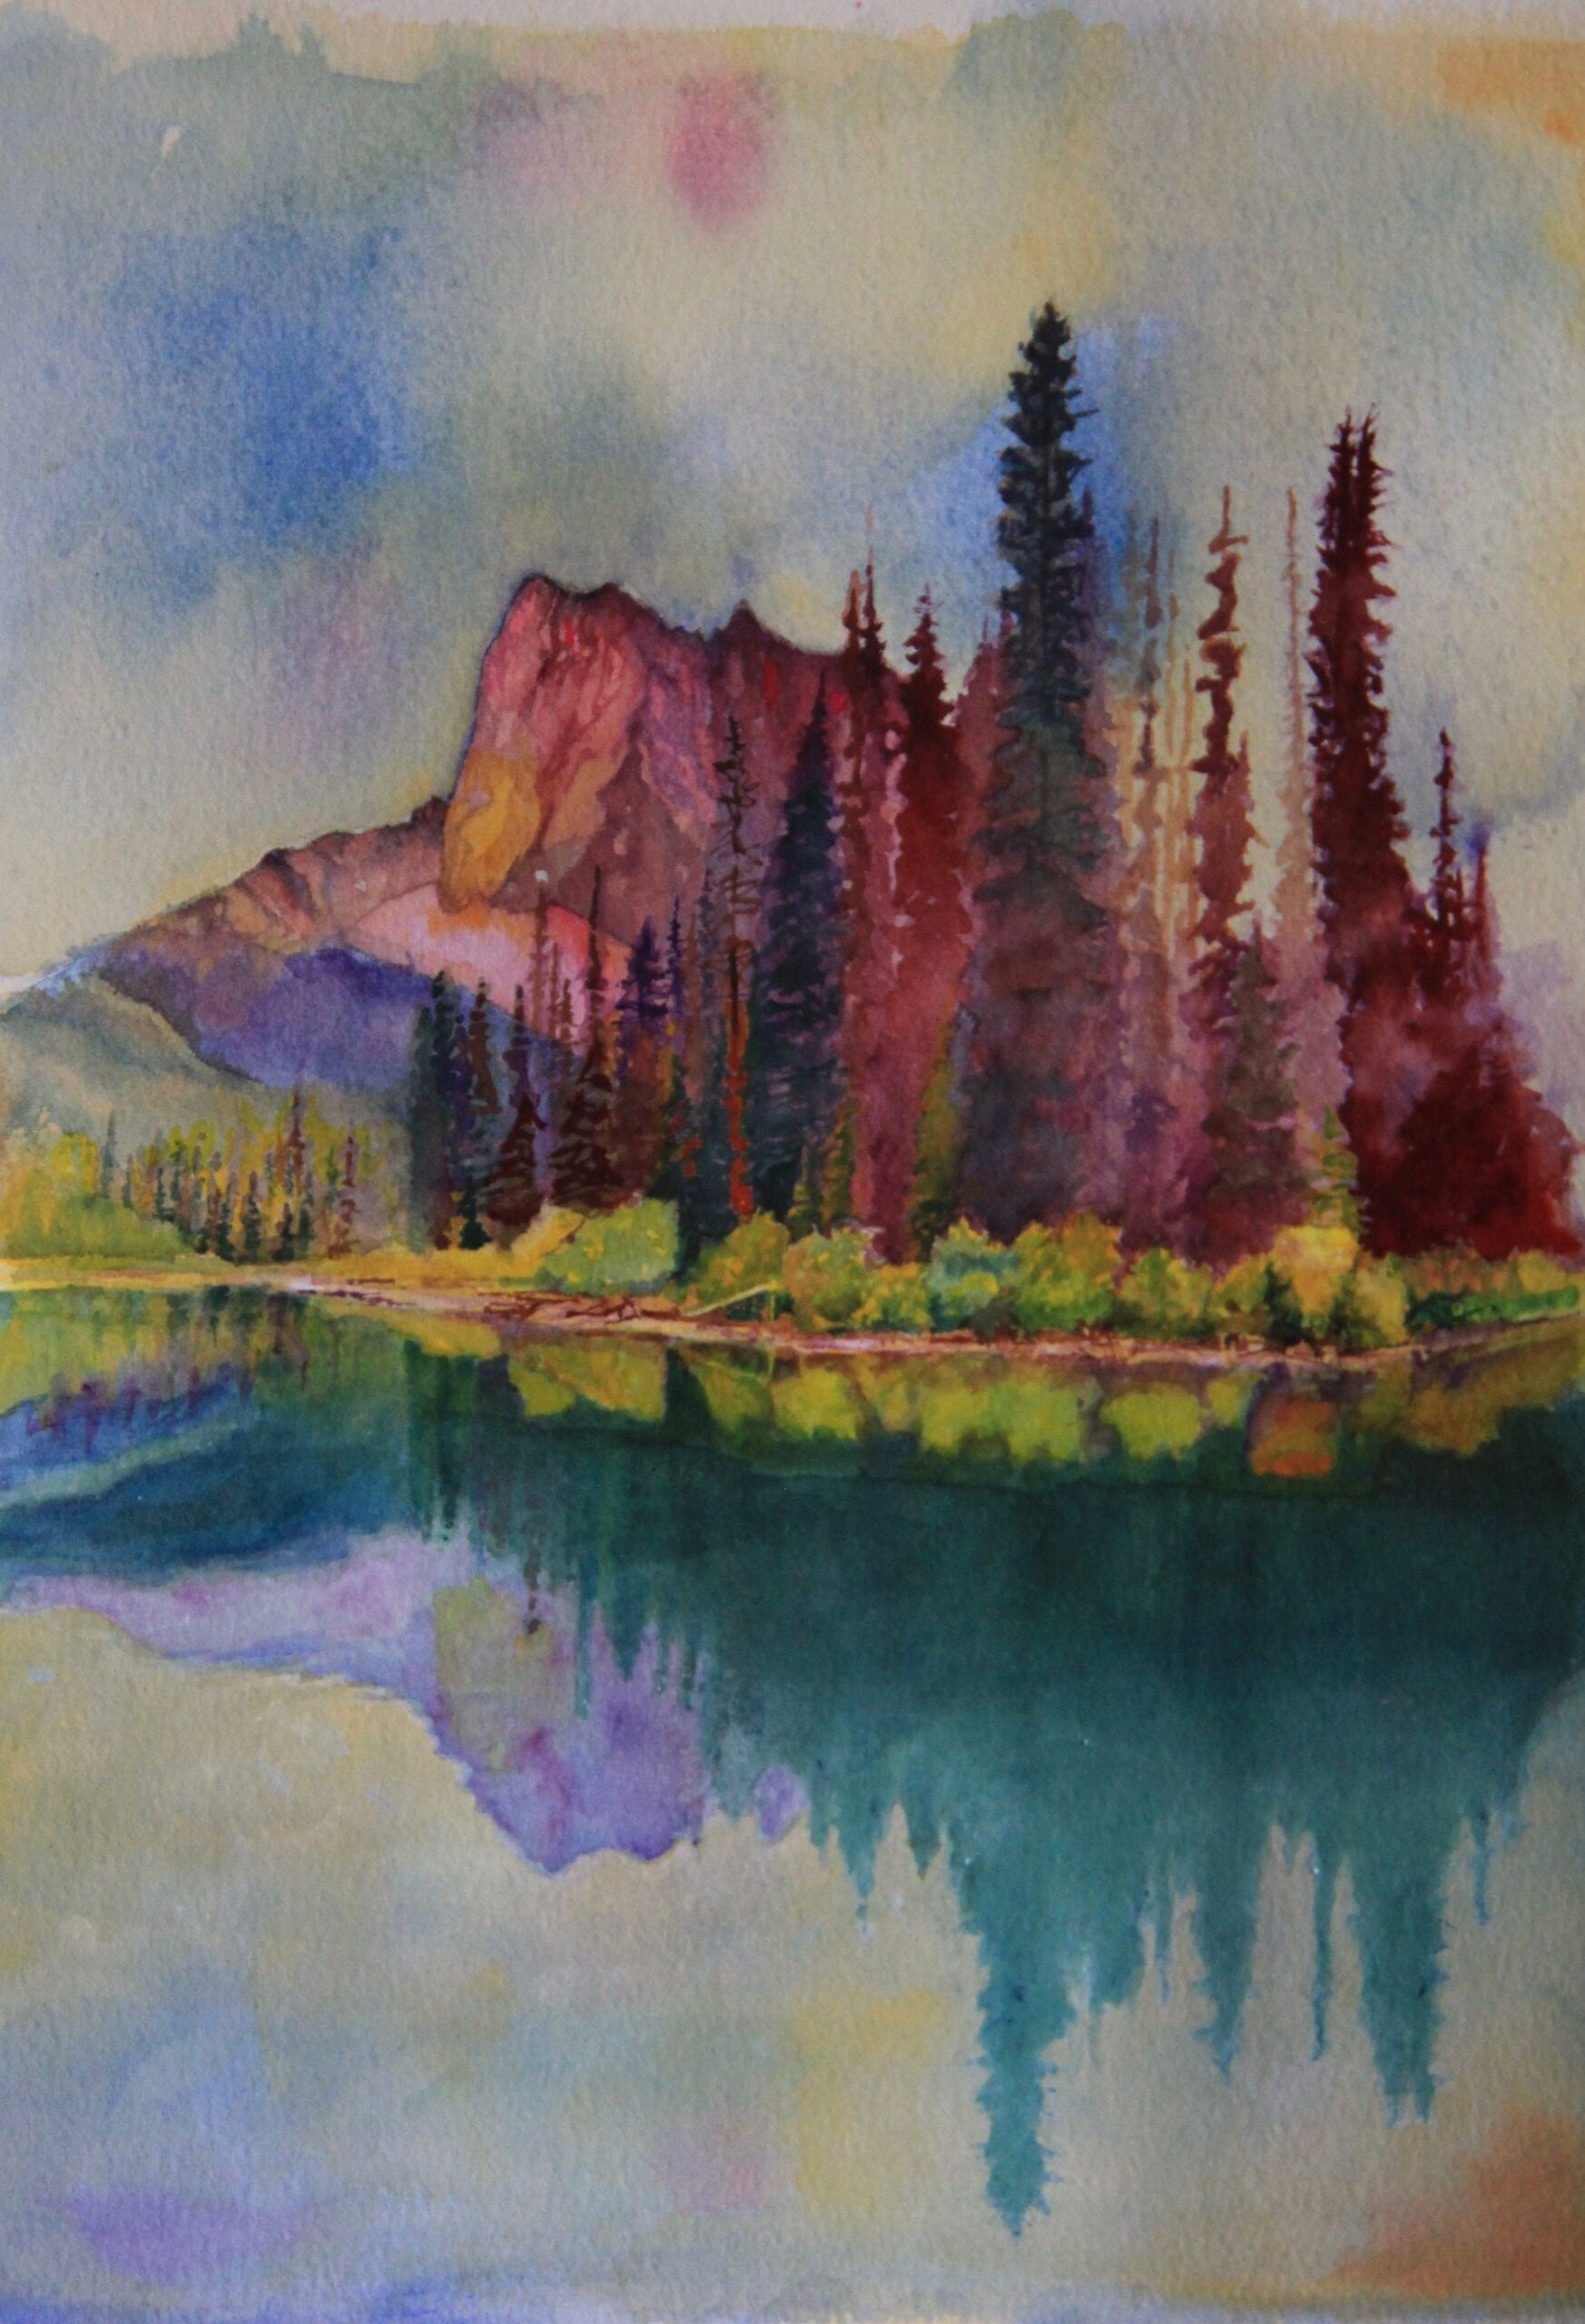 Mt. Burgess and Emerald Lake